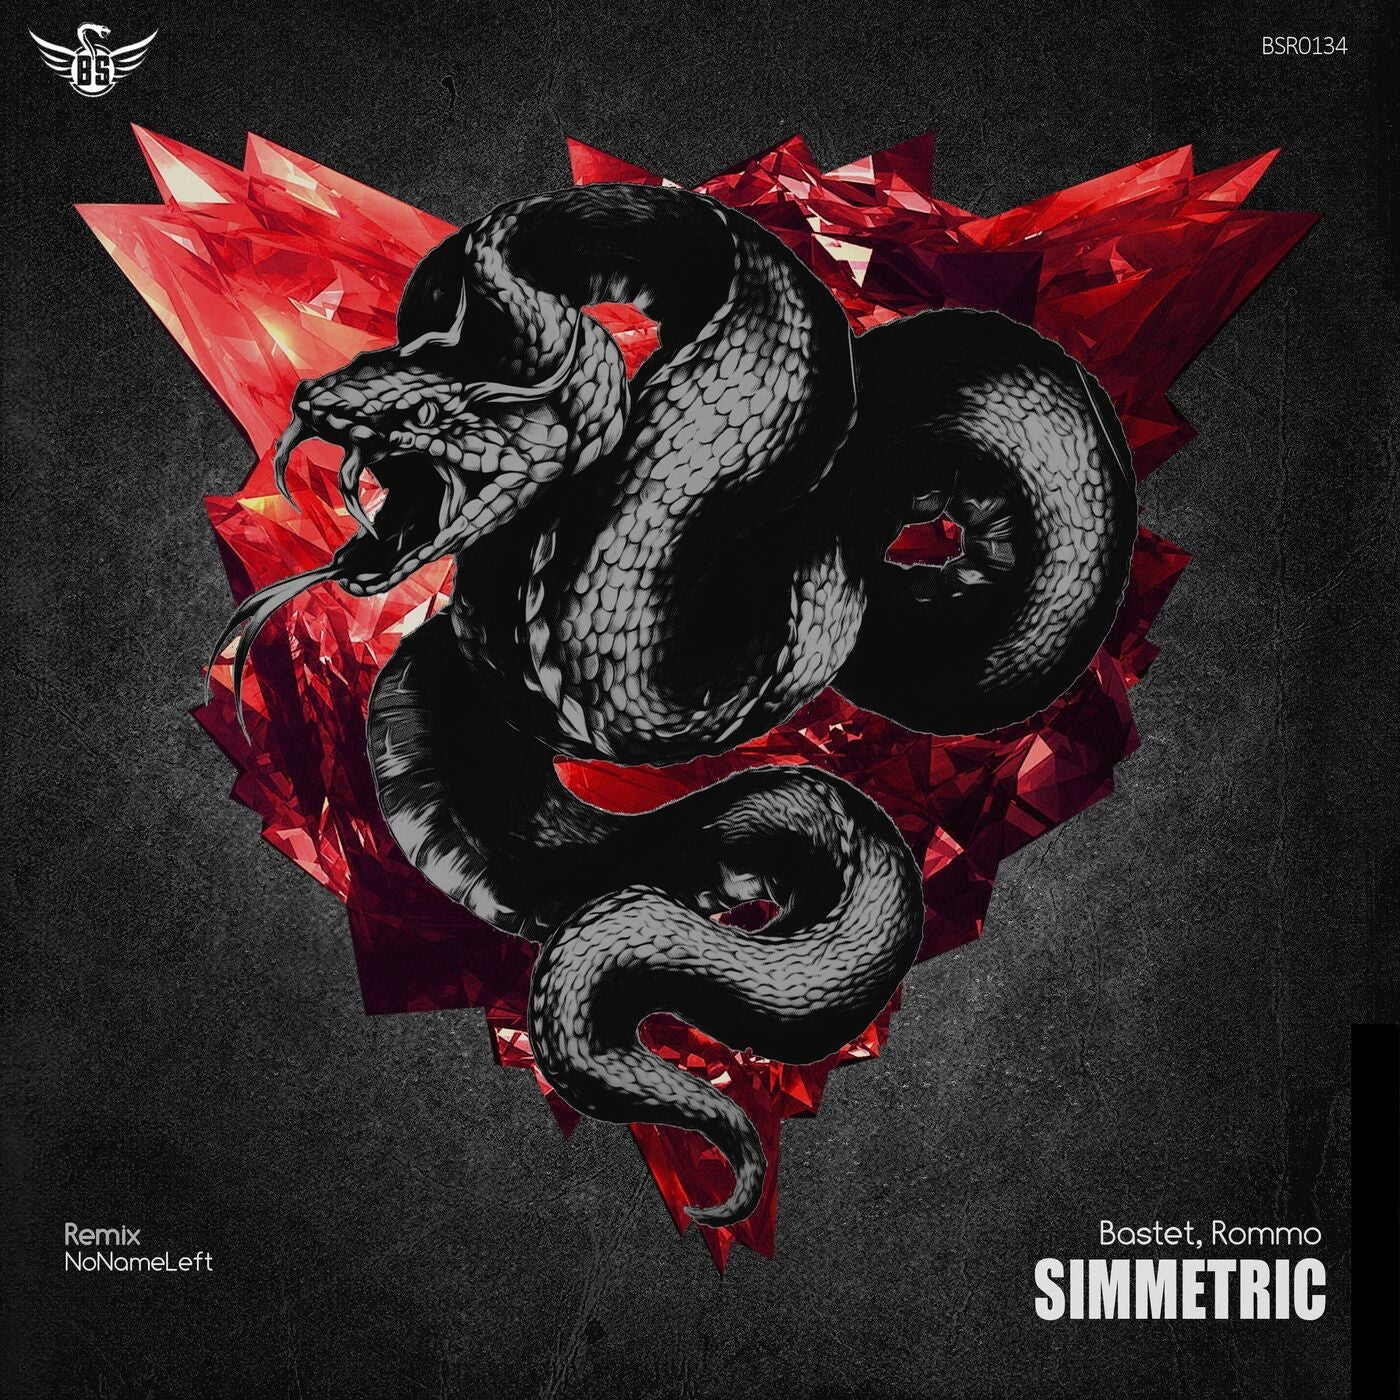 Simmetric (NoNameLeft Remix)